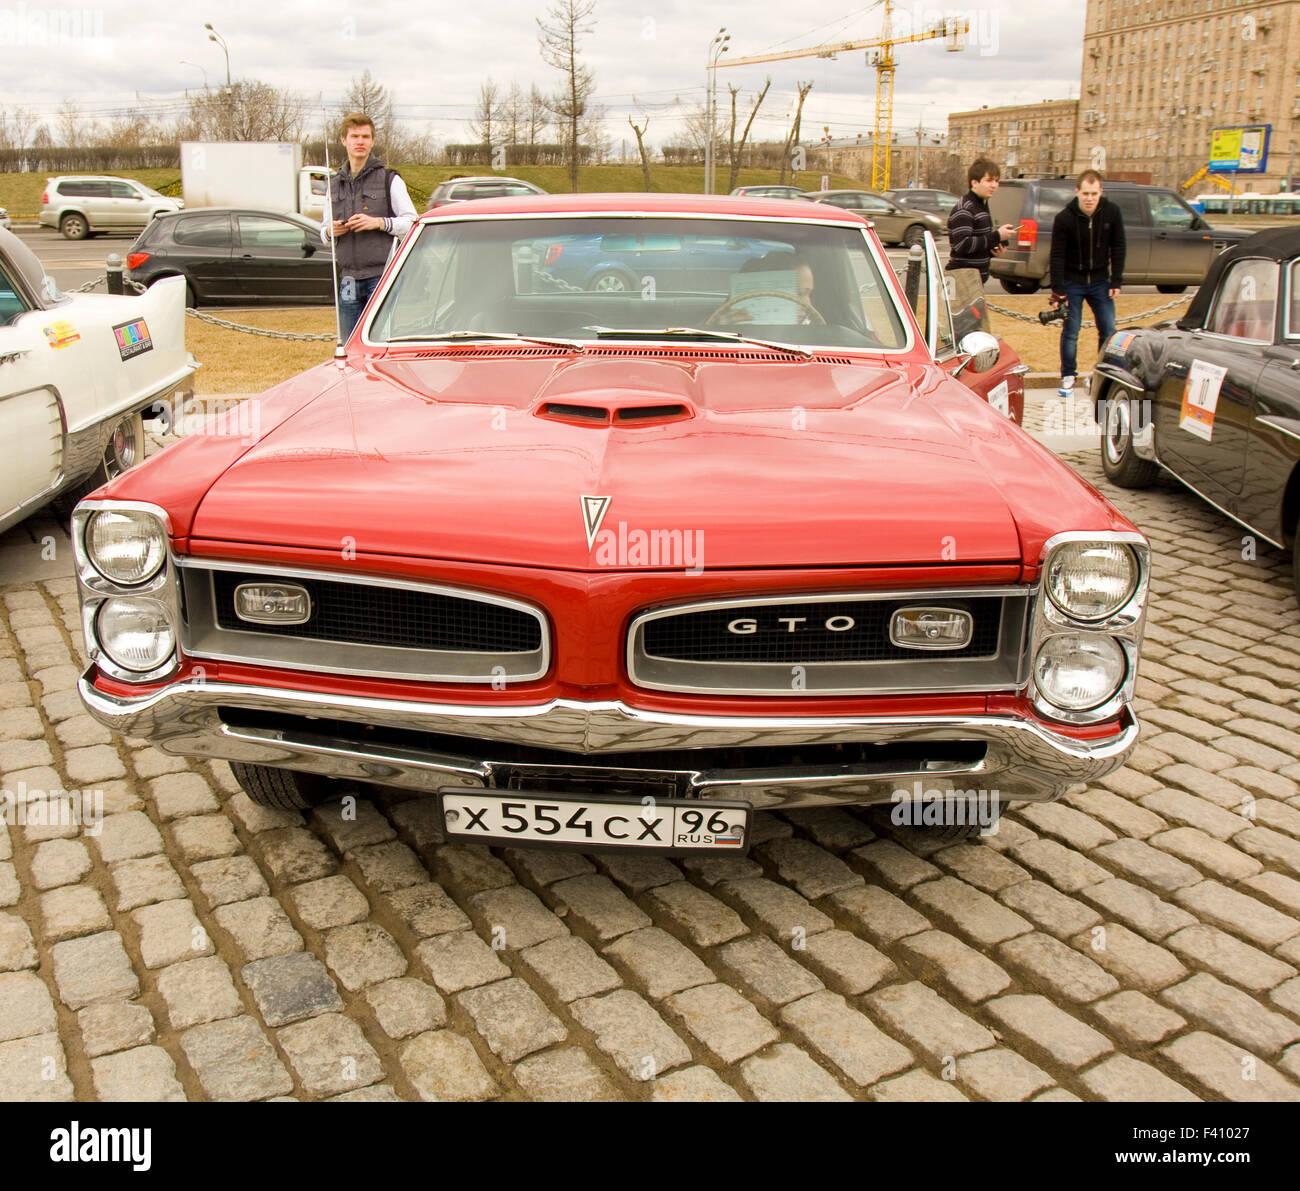 Pontiac Gto Stock Photos Images Alamy 1960 Judge Moscow April 21 Retro Car On Rally Of Classical Cars Poklonnaya